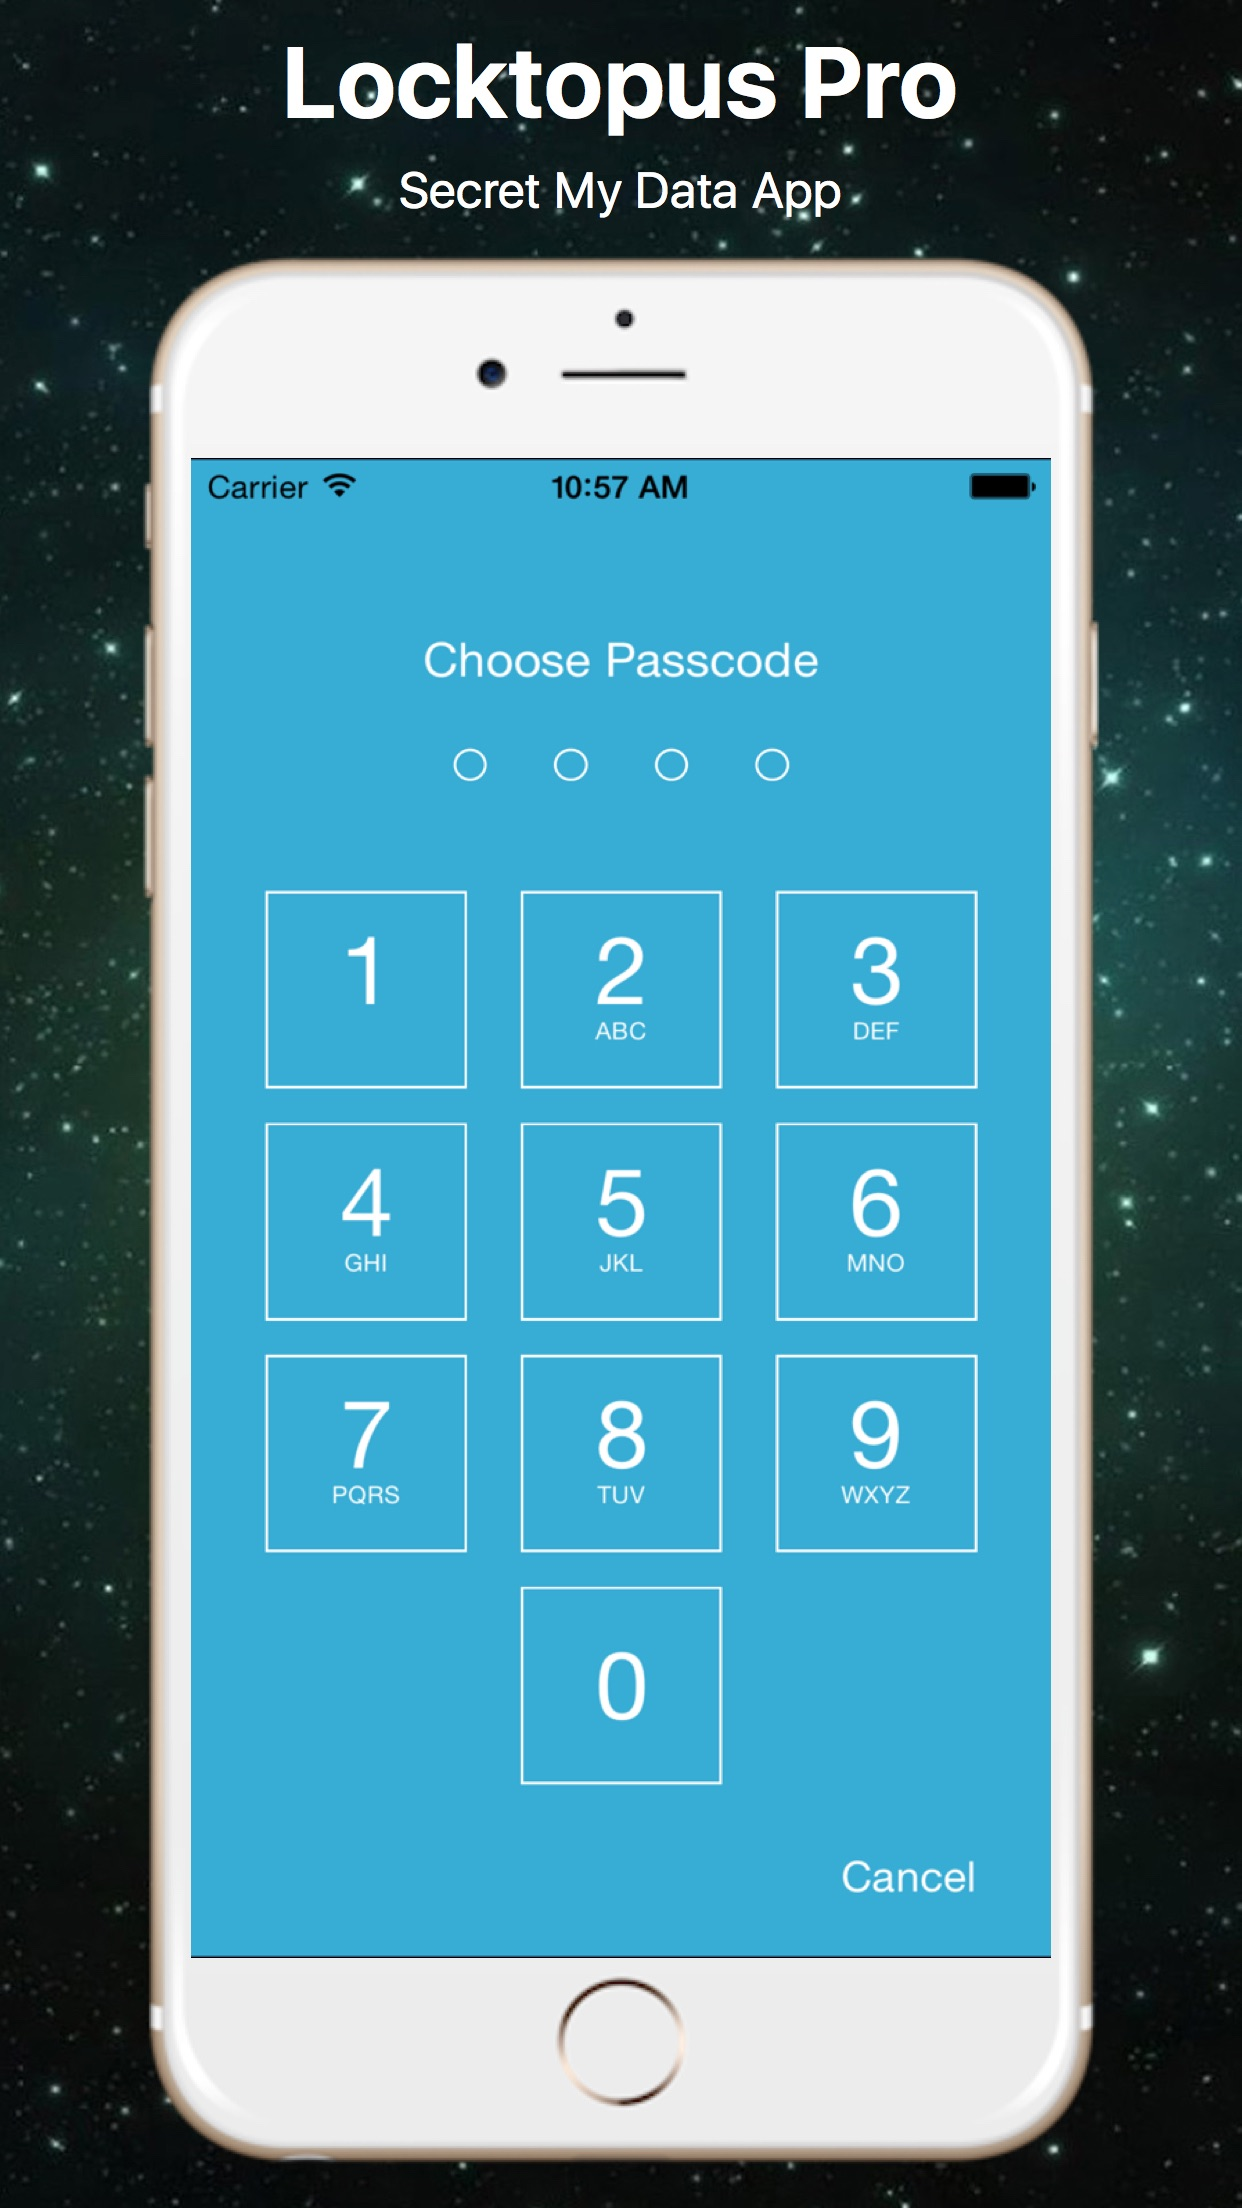 LocktoPus Plus - Secret Data App Screenshot